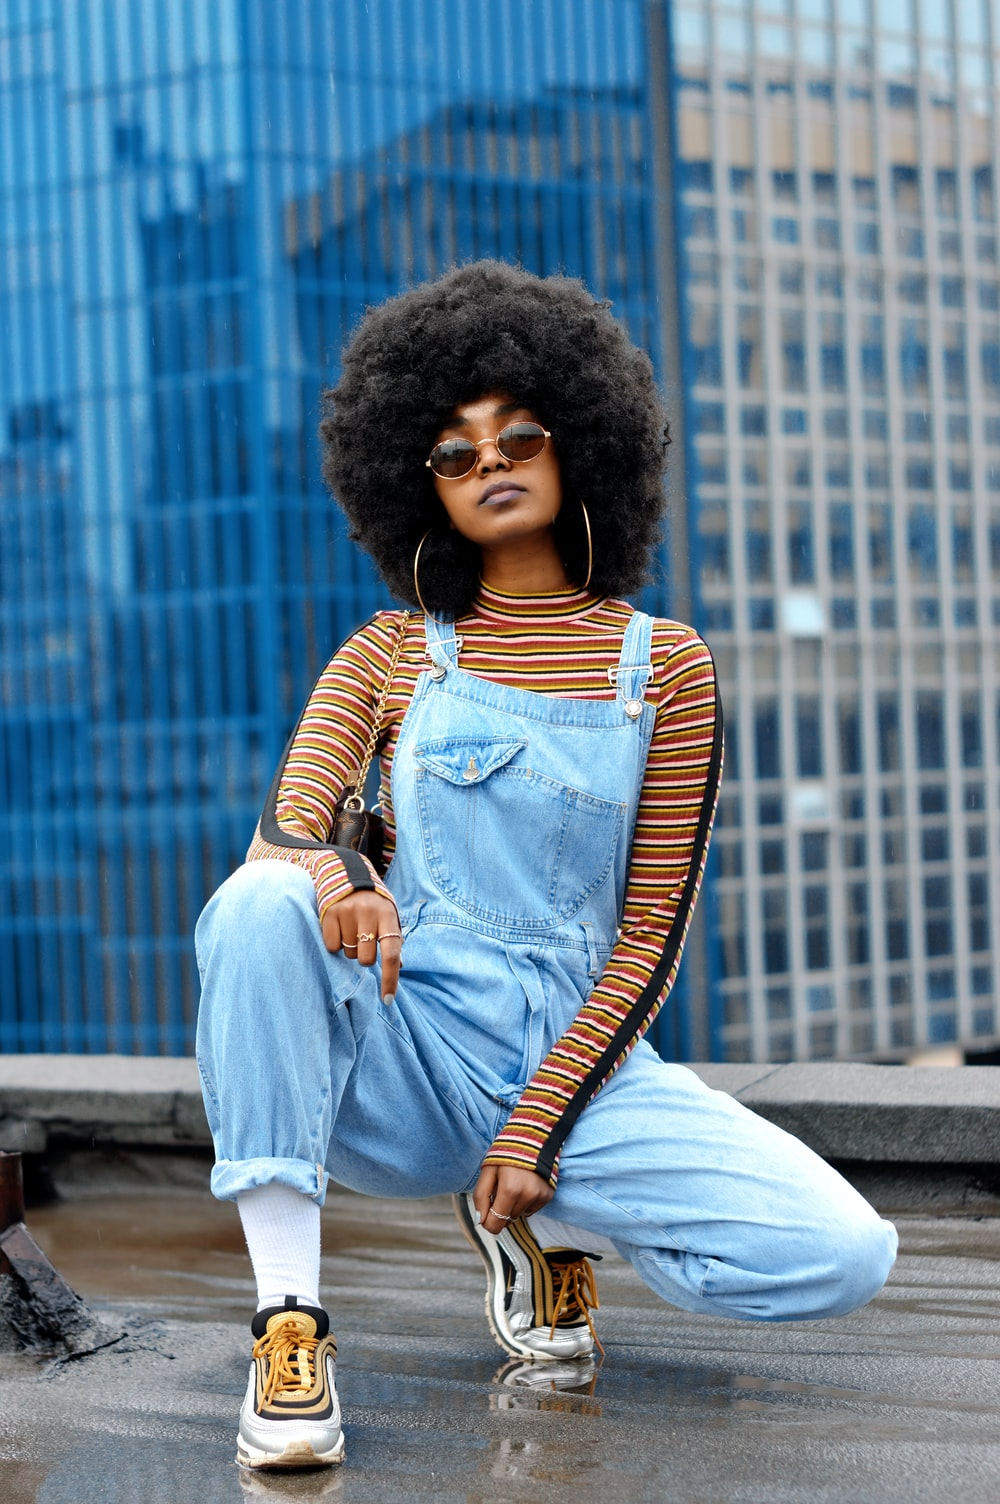 woman in blue denim jacket sitting on concrete bench